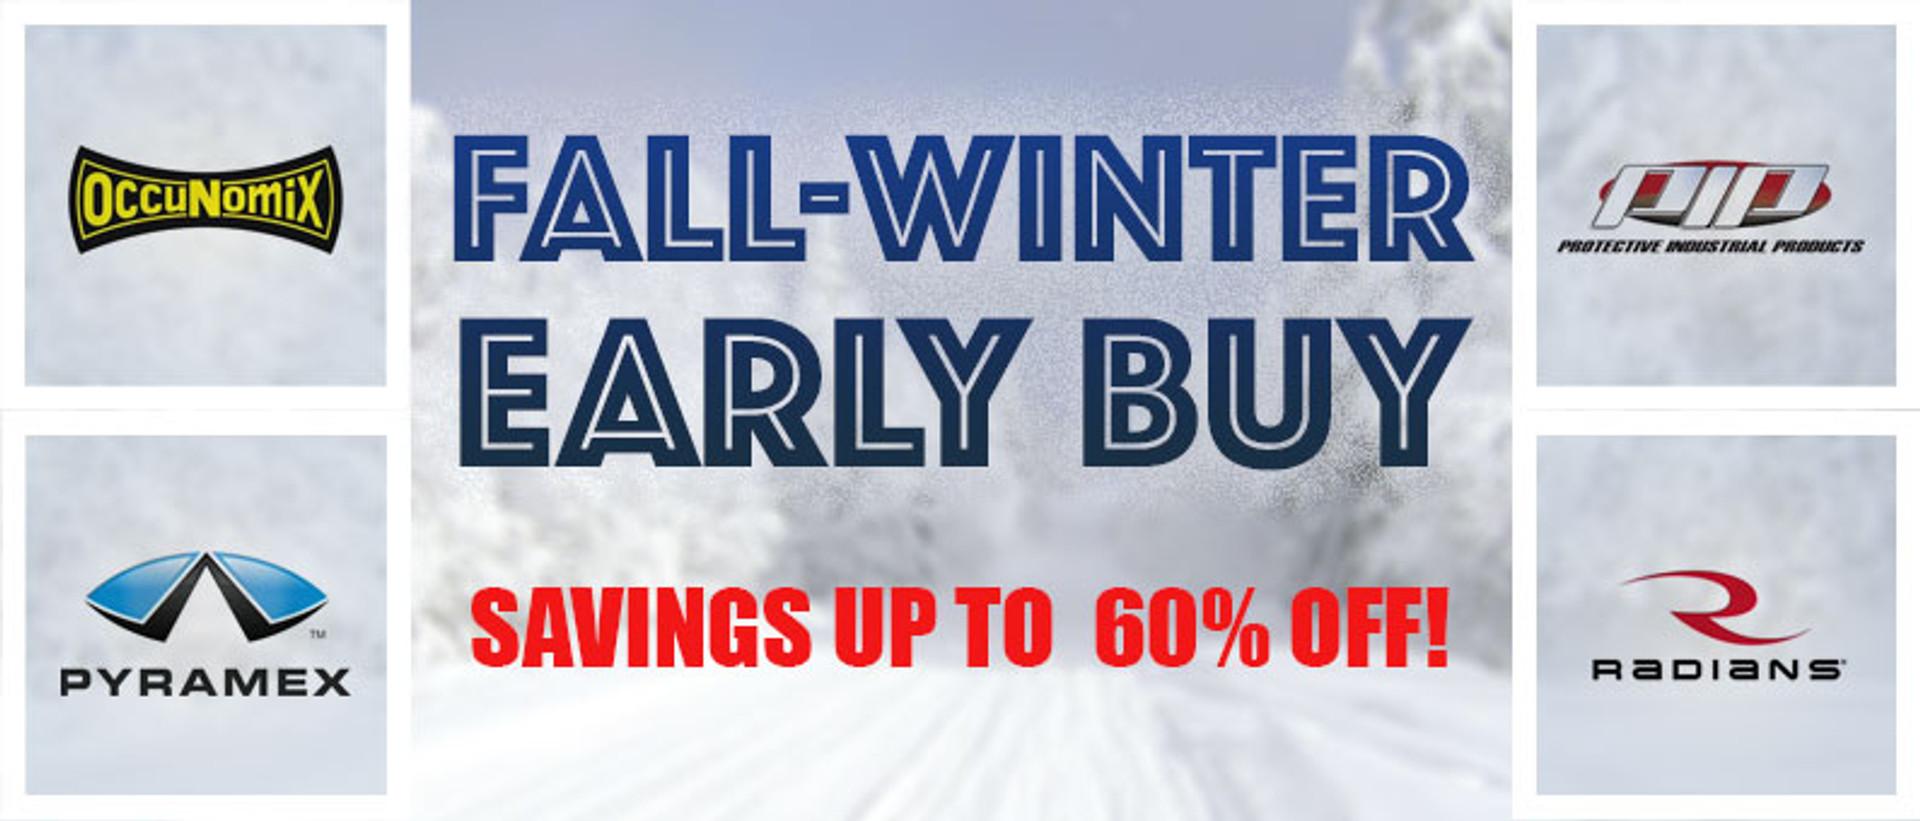 Fall-Winter Early Buy